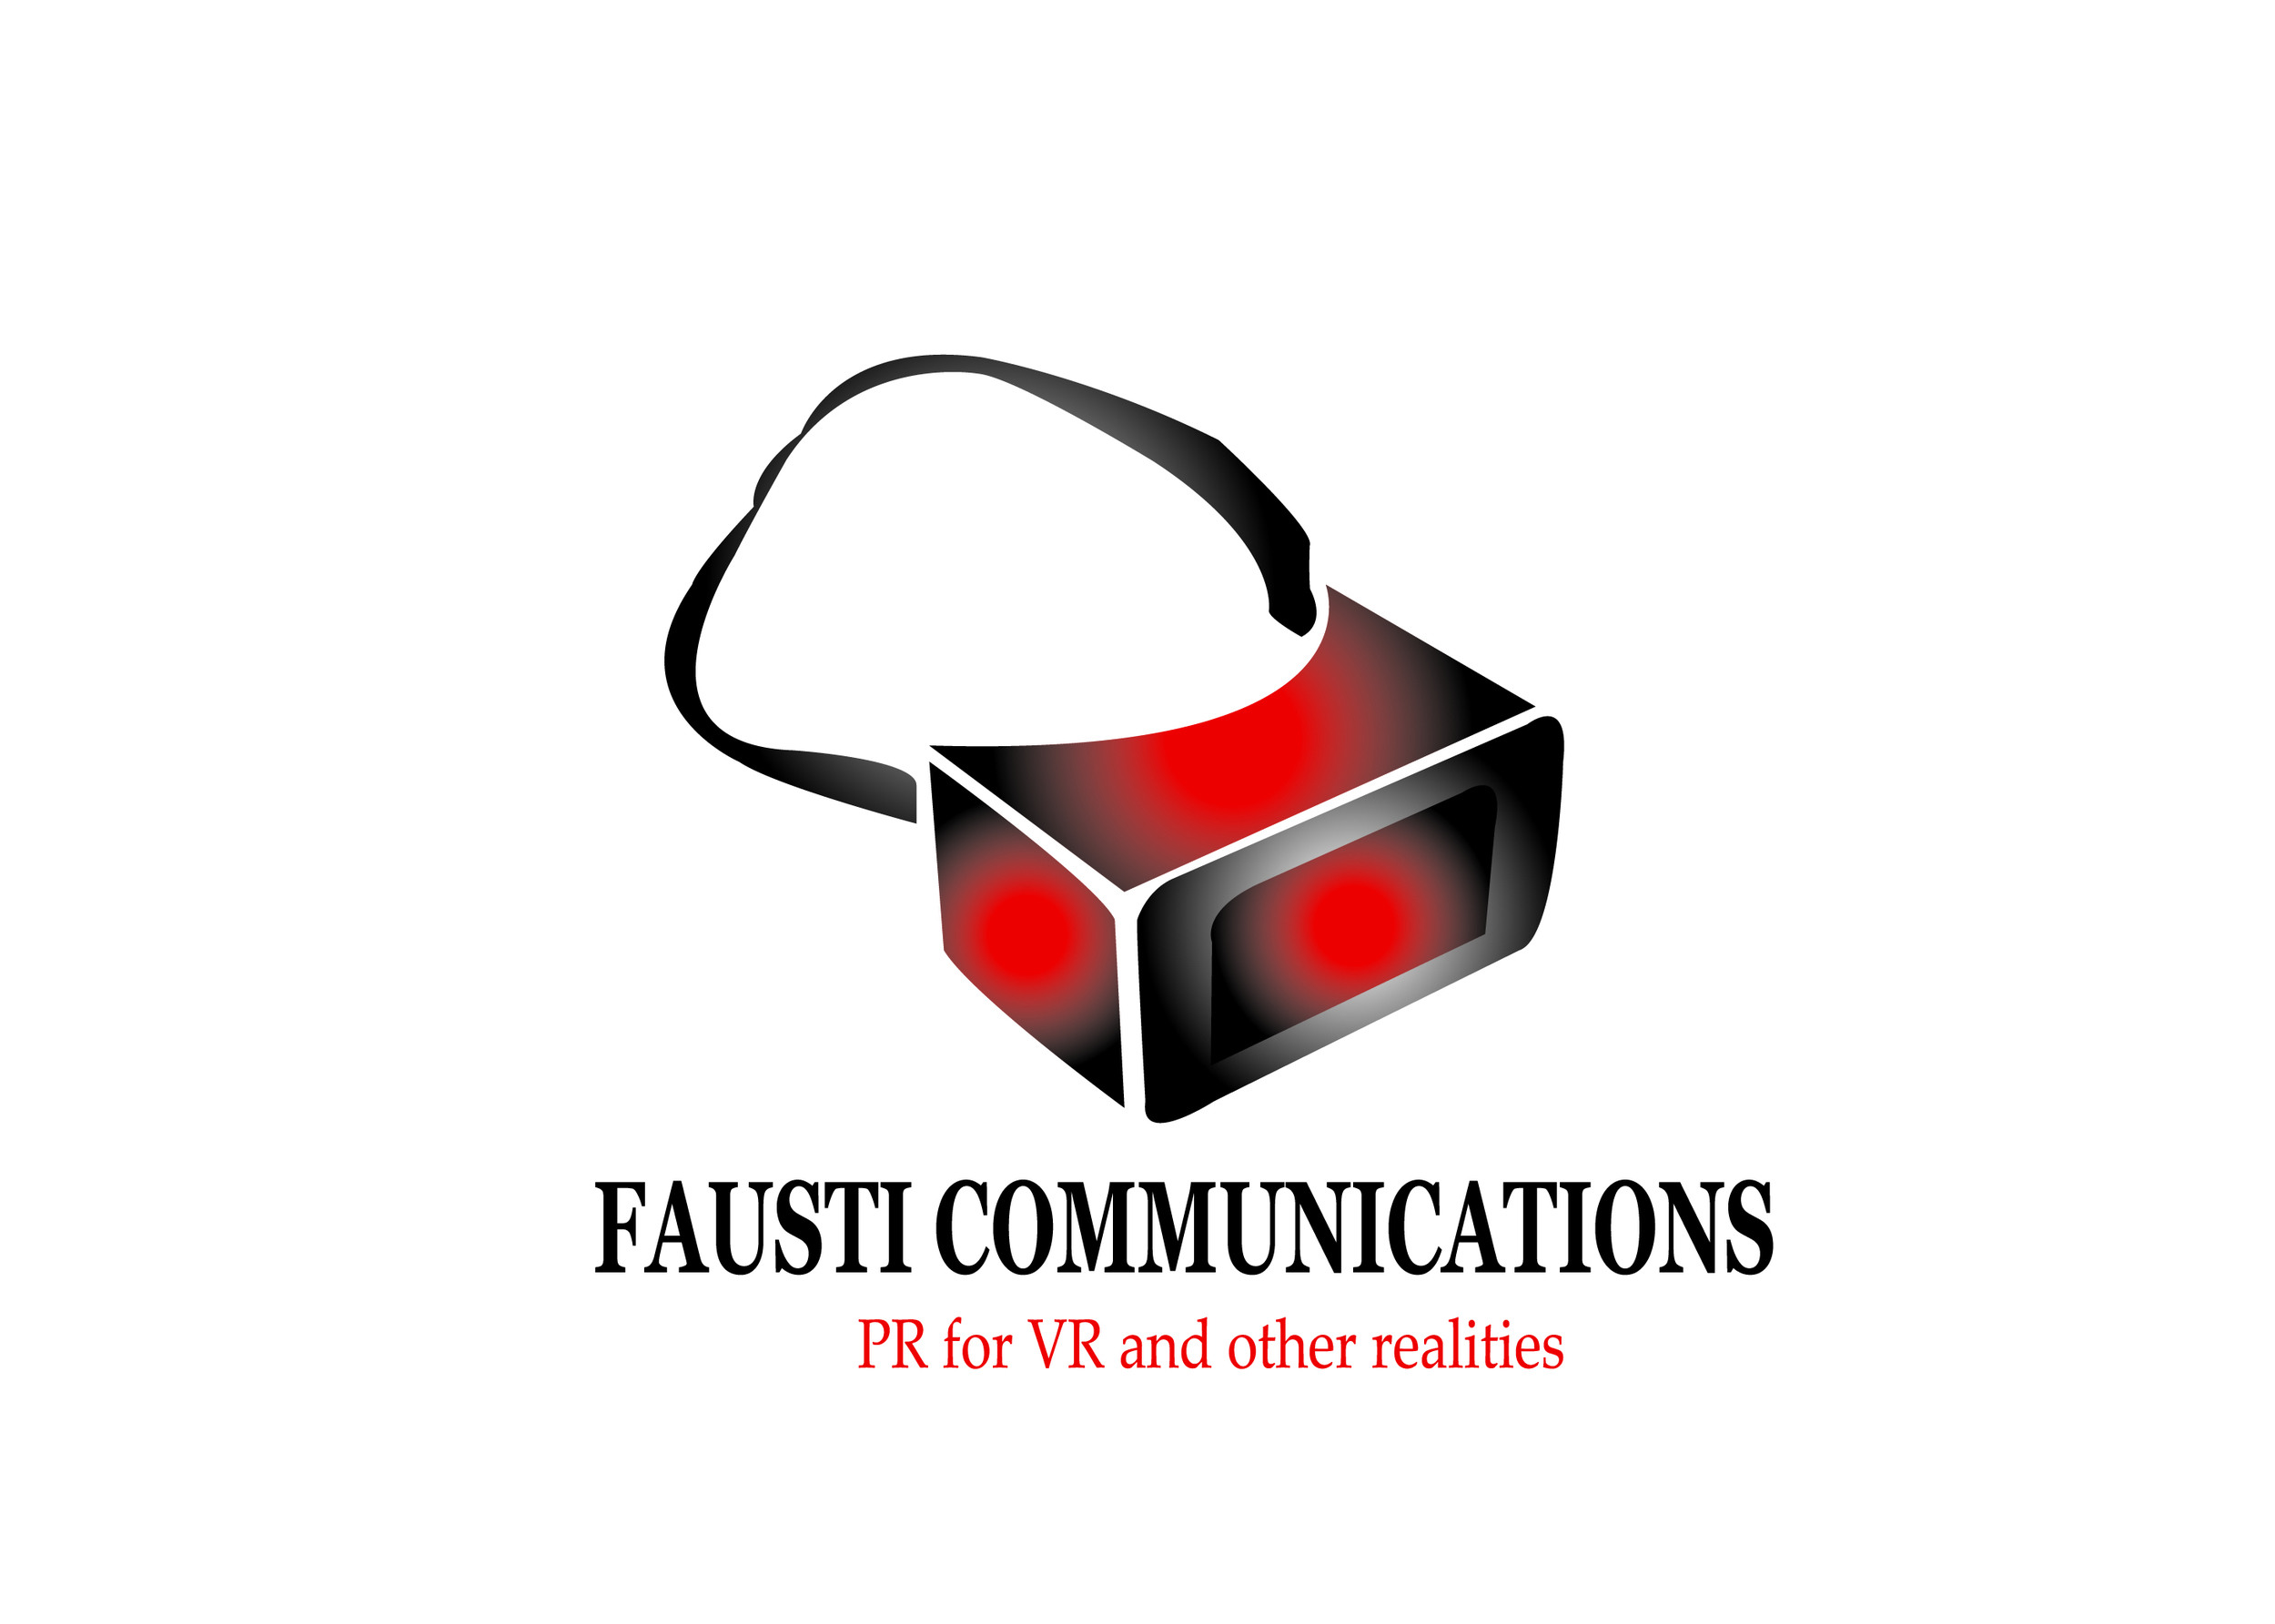 FaustiComms logo.jpg